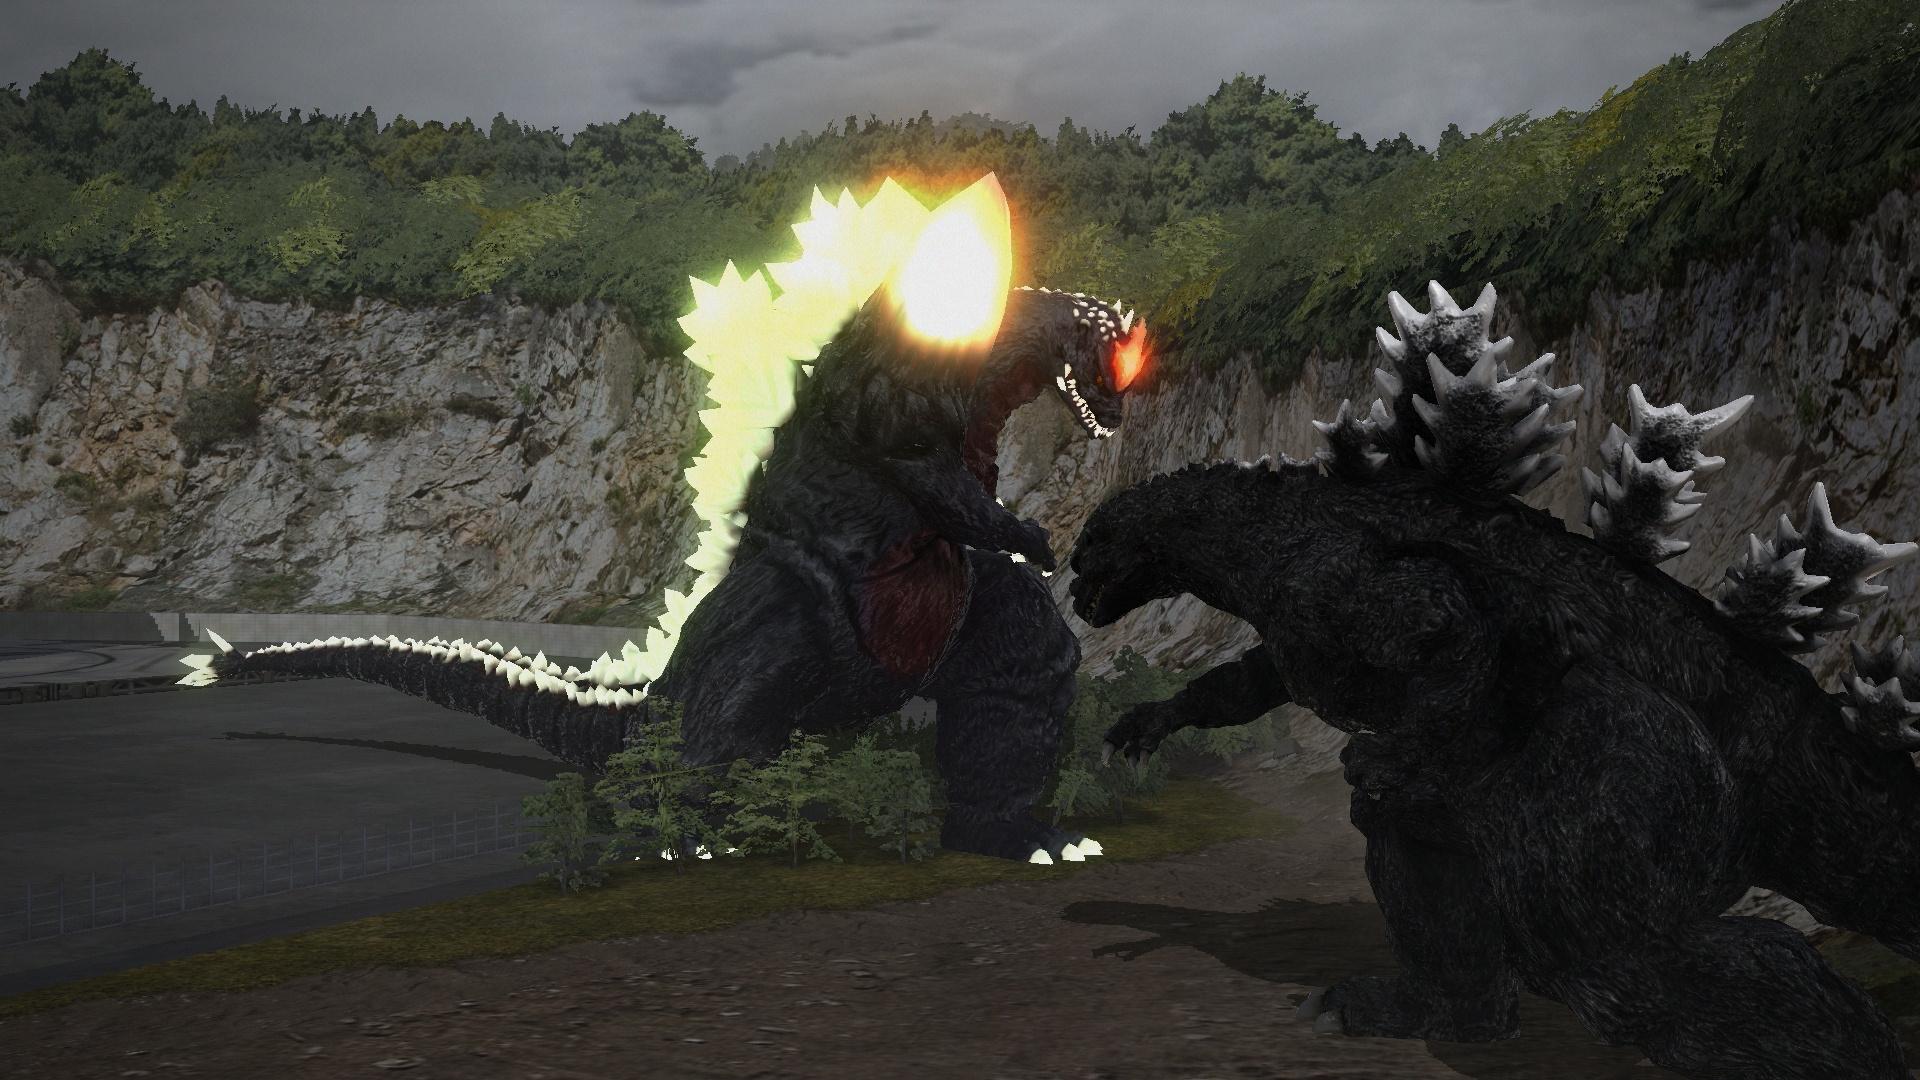 Godzilla Ps3 Playstation 3 Game Profile News